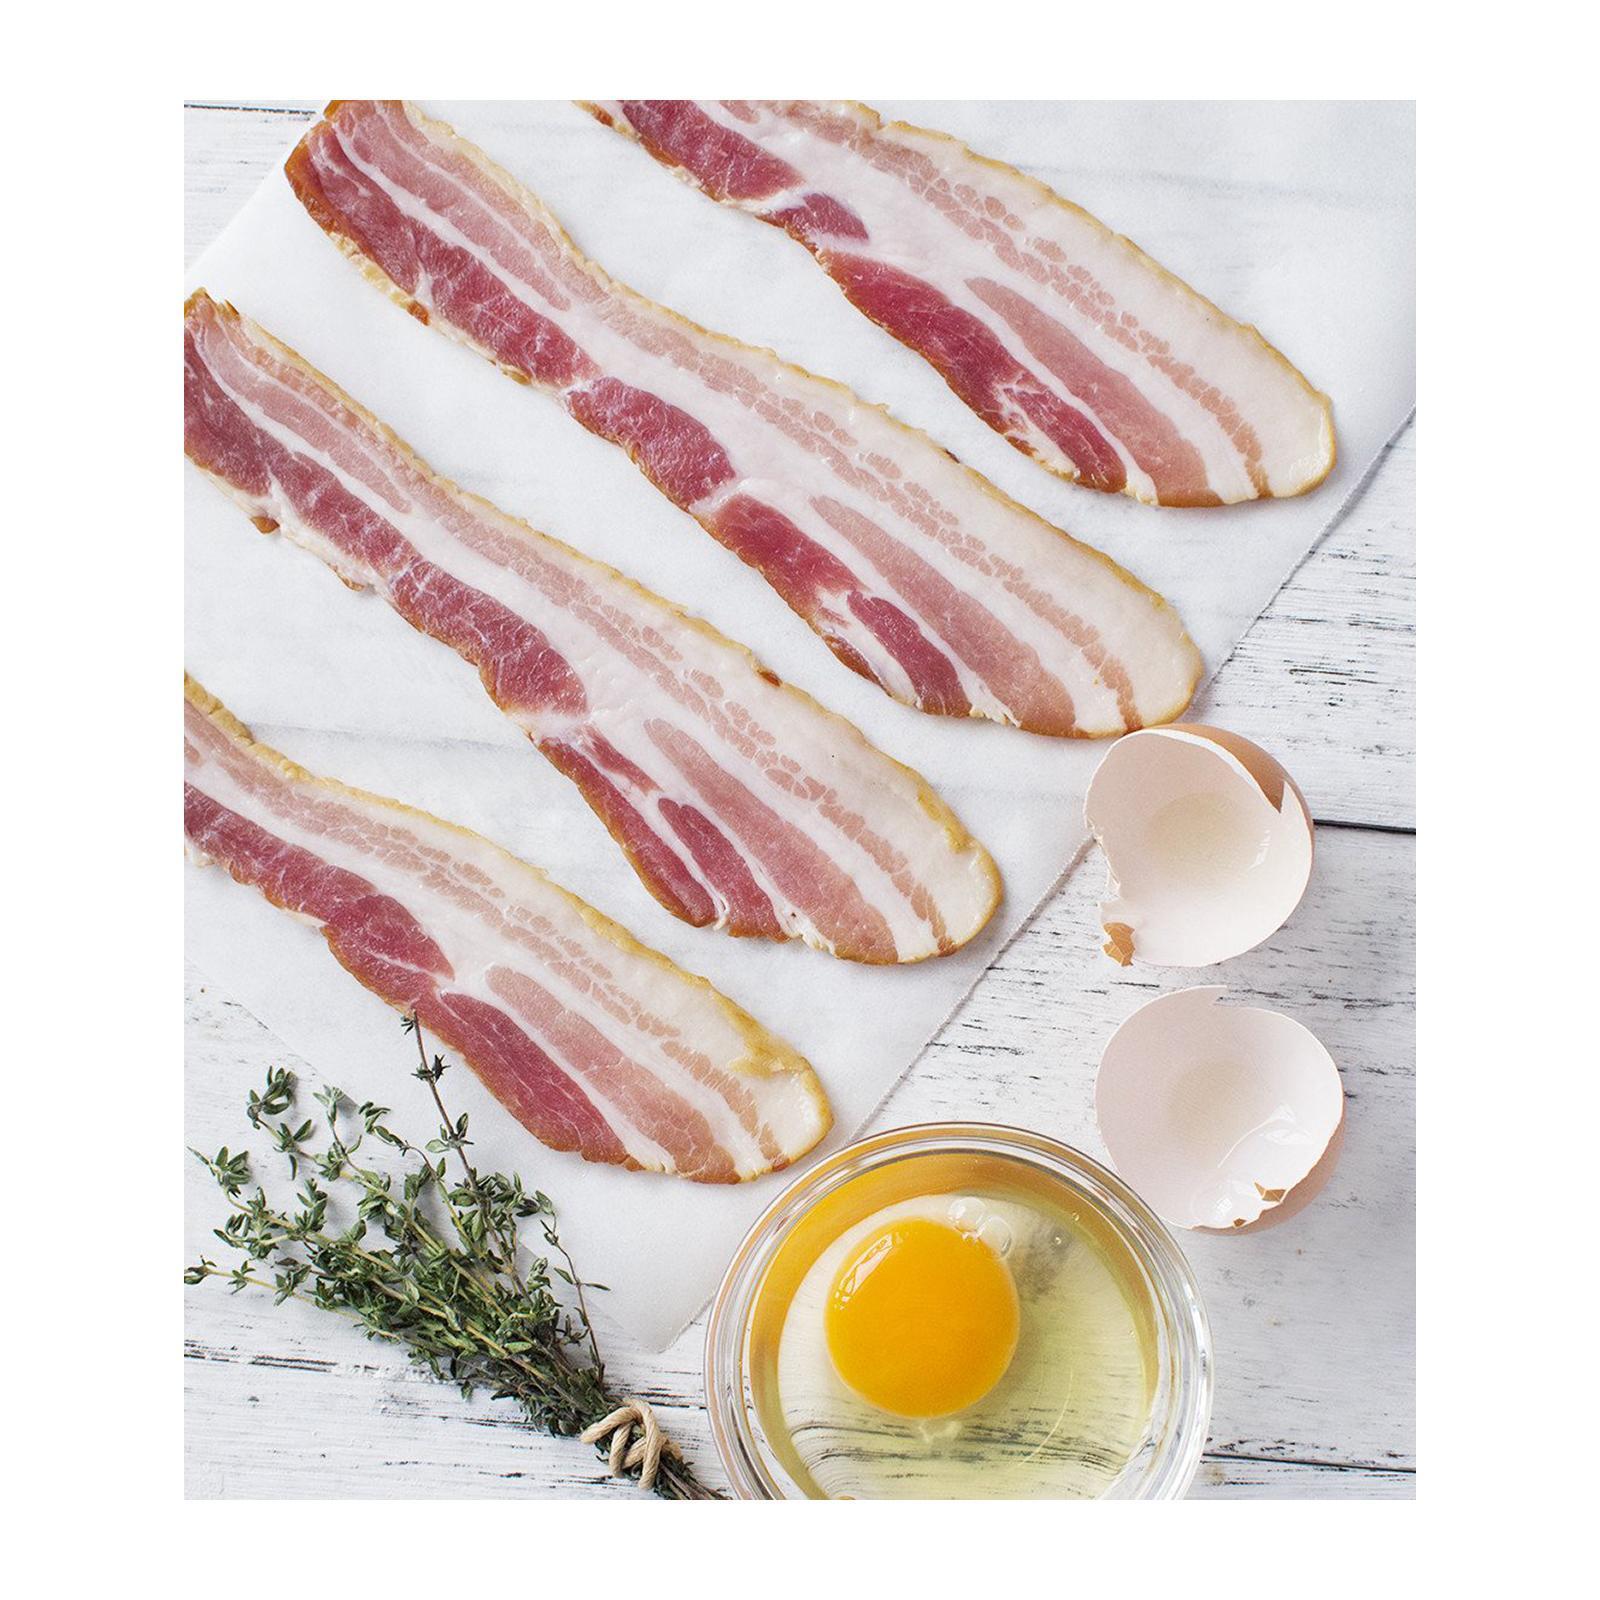 Sasha's Fine Foods Bacon Streaky Smoked - Frozen